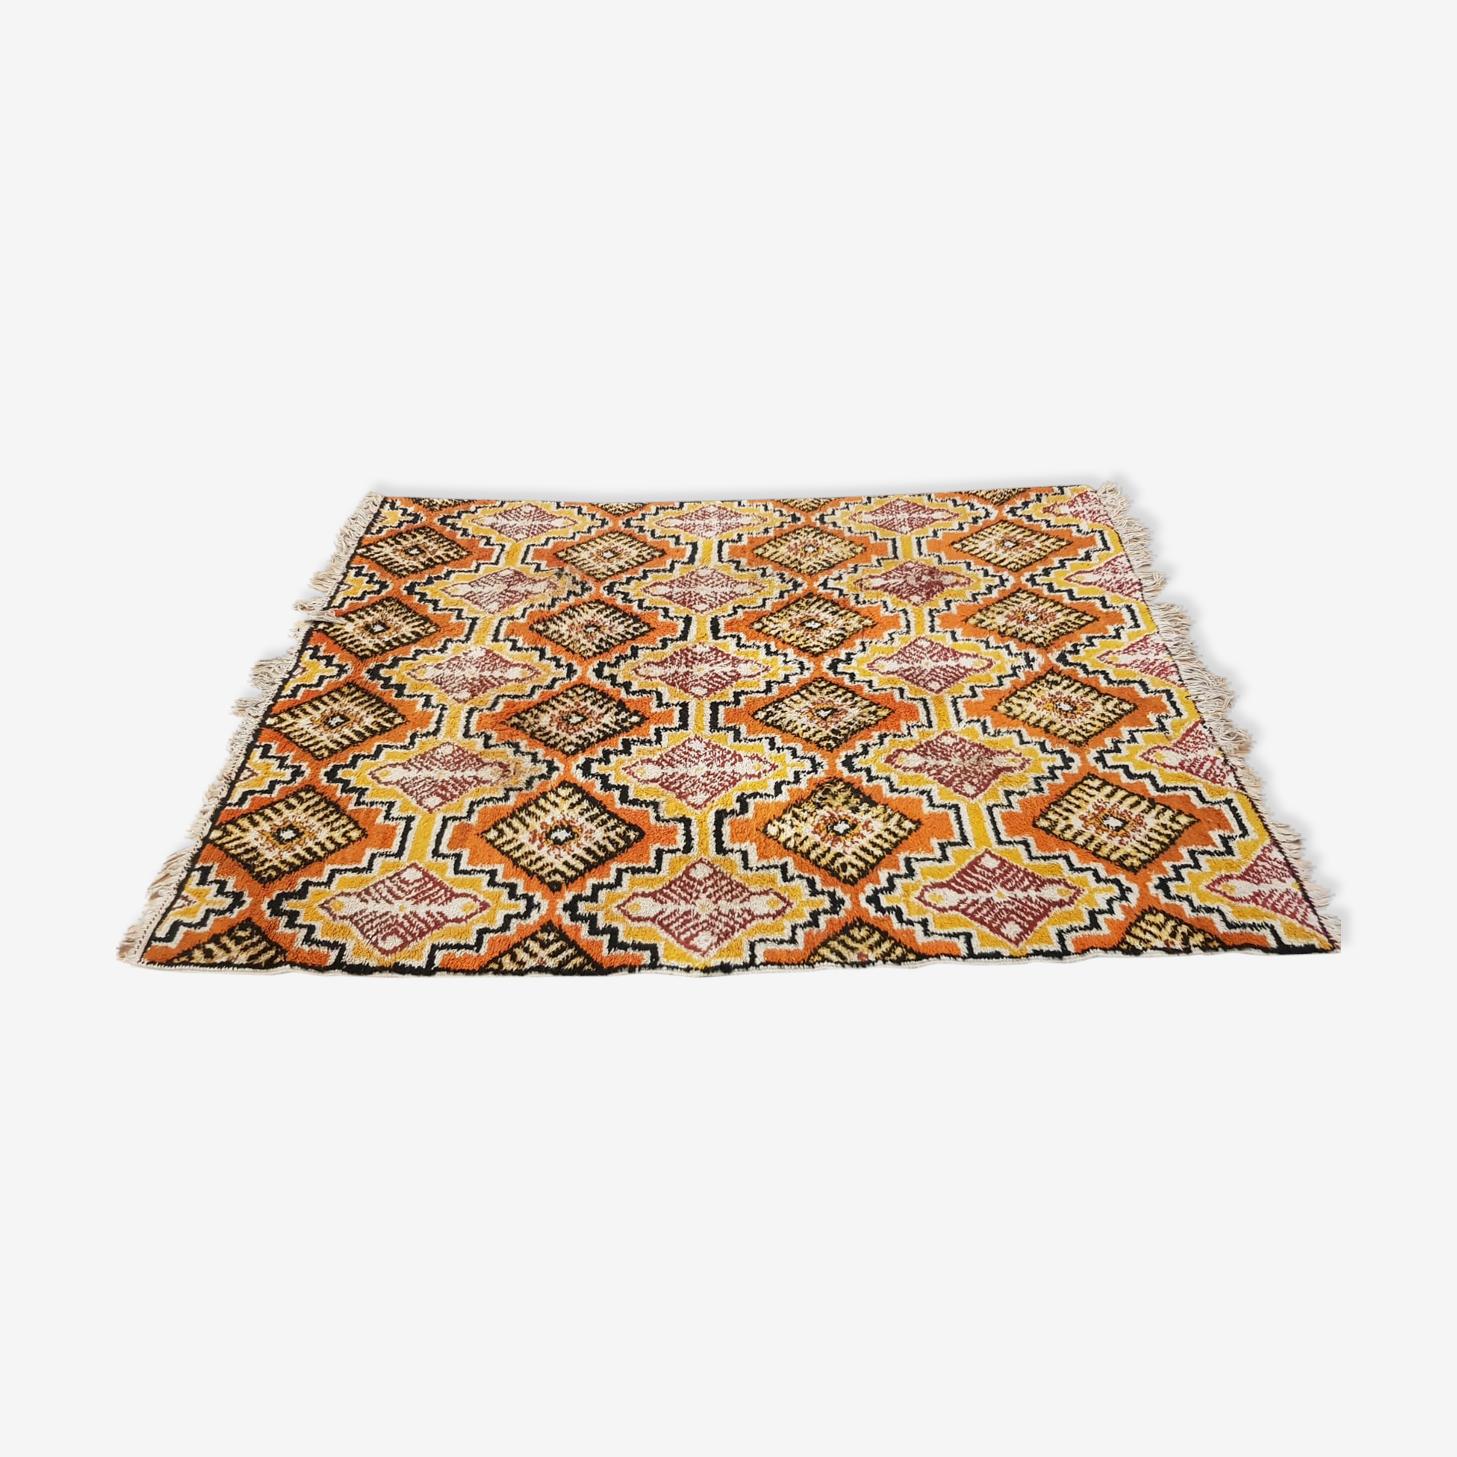 Carpet rabat Morocco 170x230cm